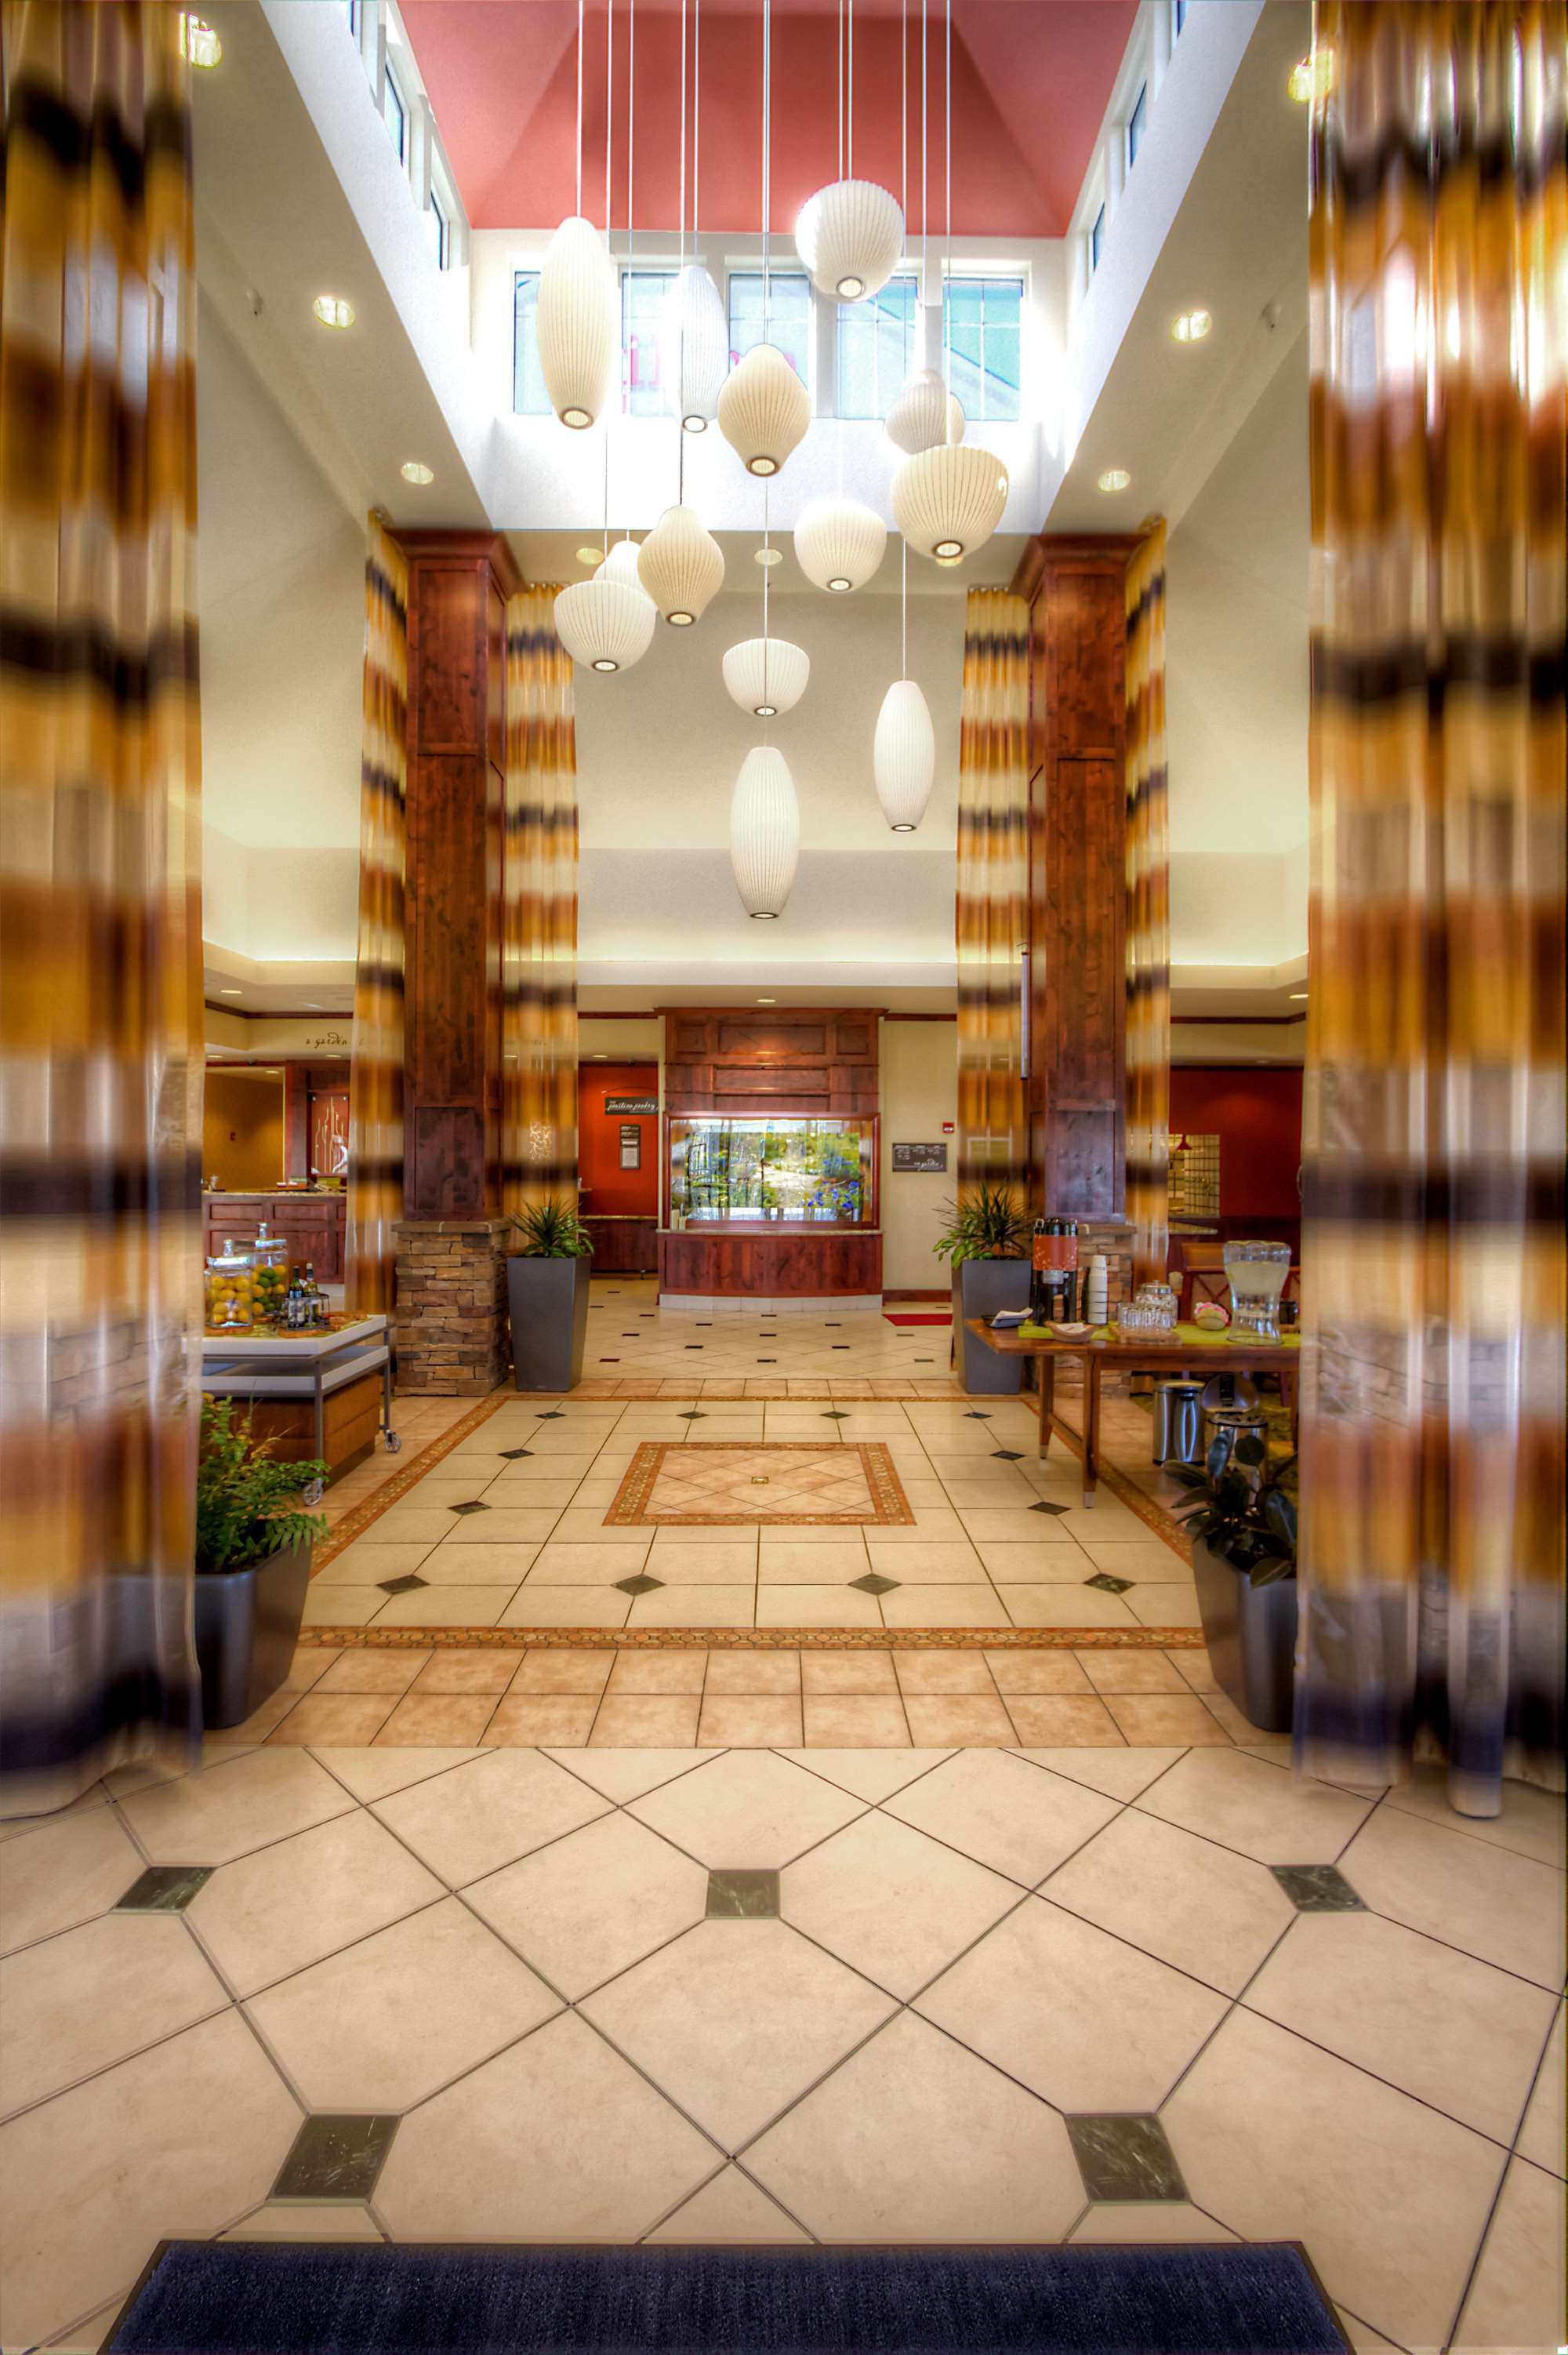 Hilton Garden Inn Great Falls image 1